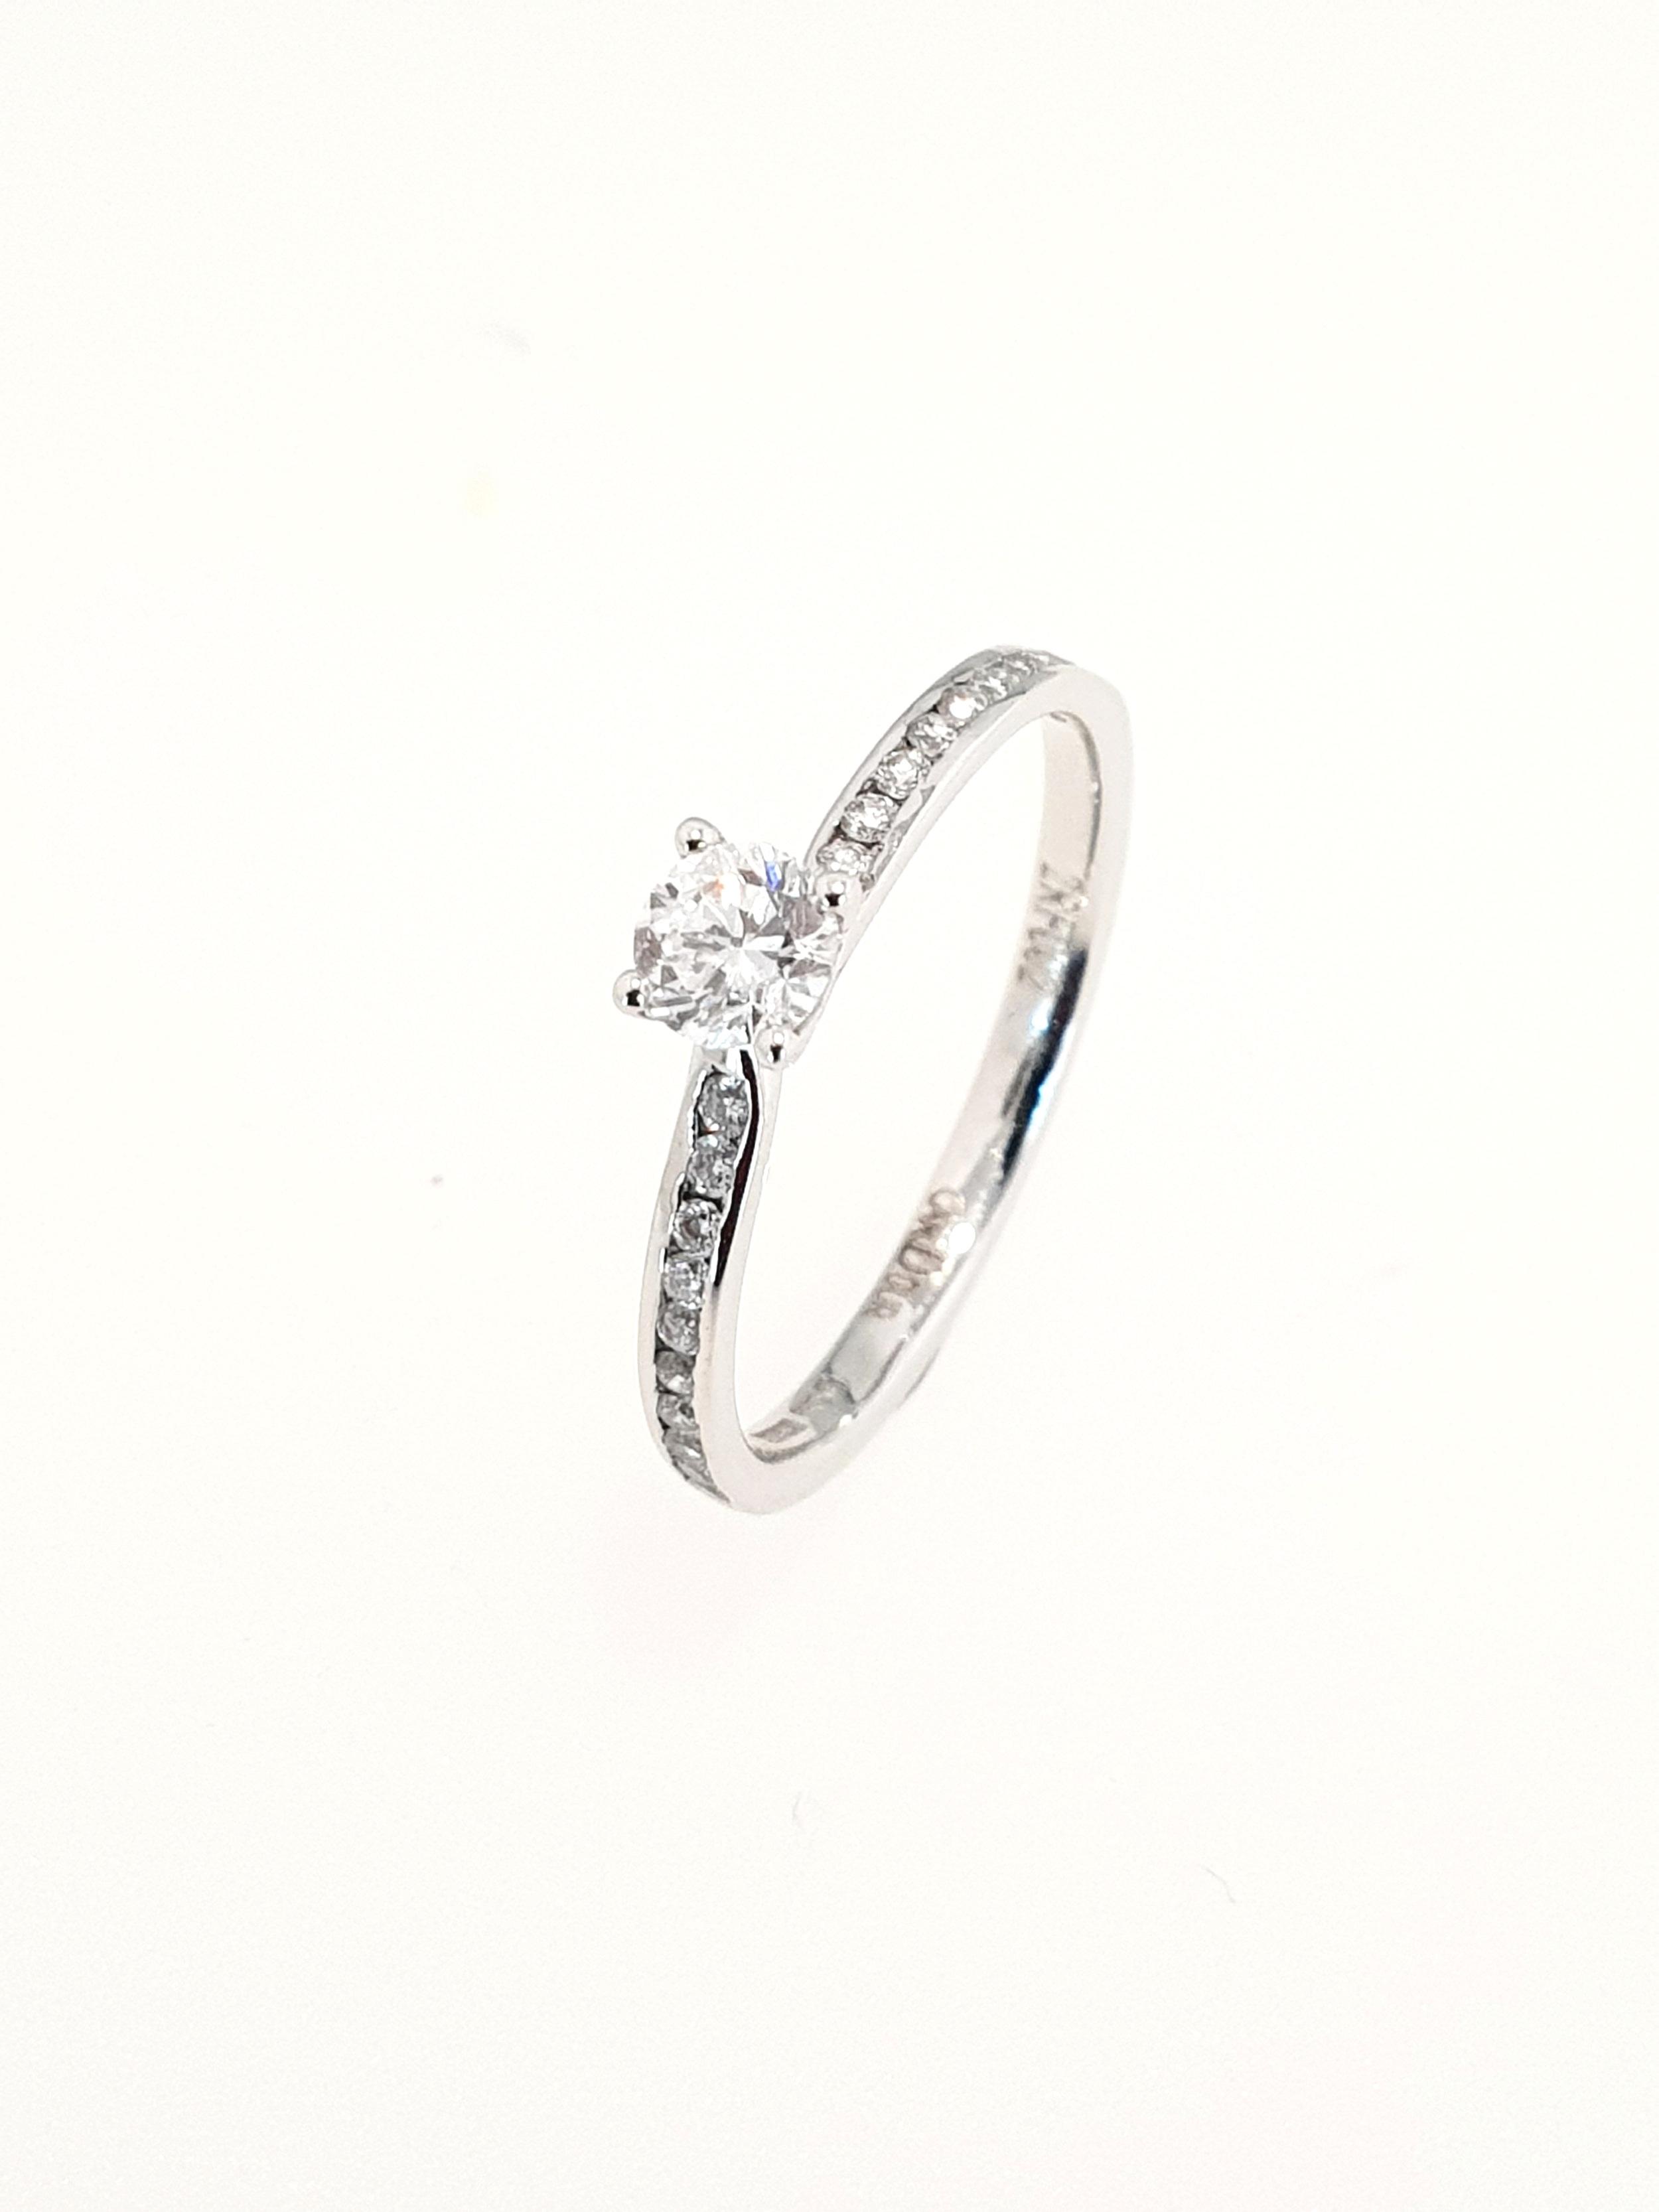 18ct White Gold Diamond Ring  TCW: .40ct, D, VS2 (1 x 25ct, 20 x .15ct)  Stock Code: N8633  £1400